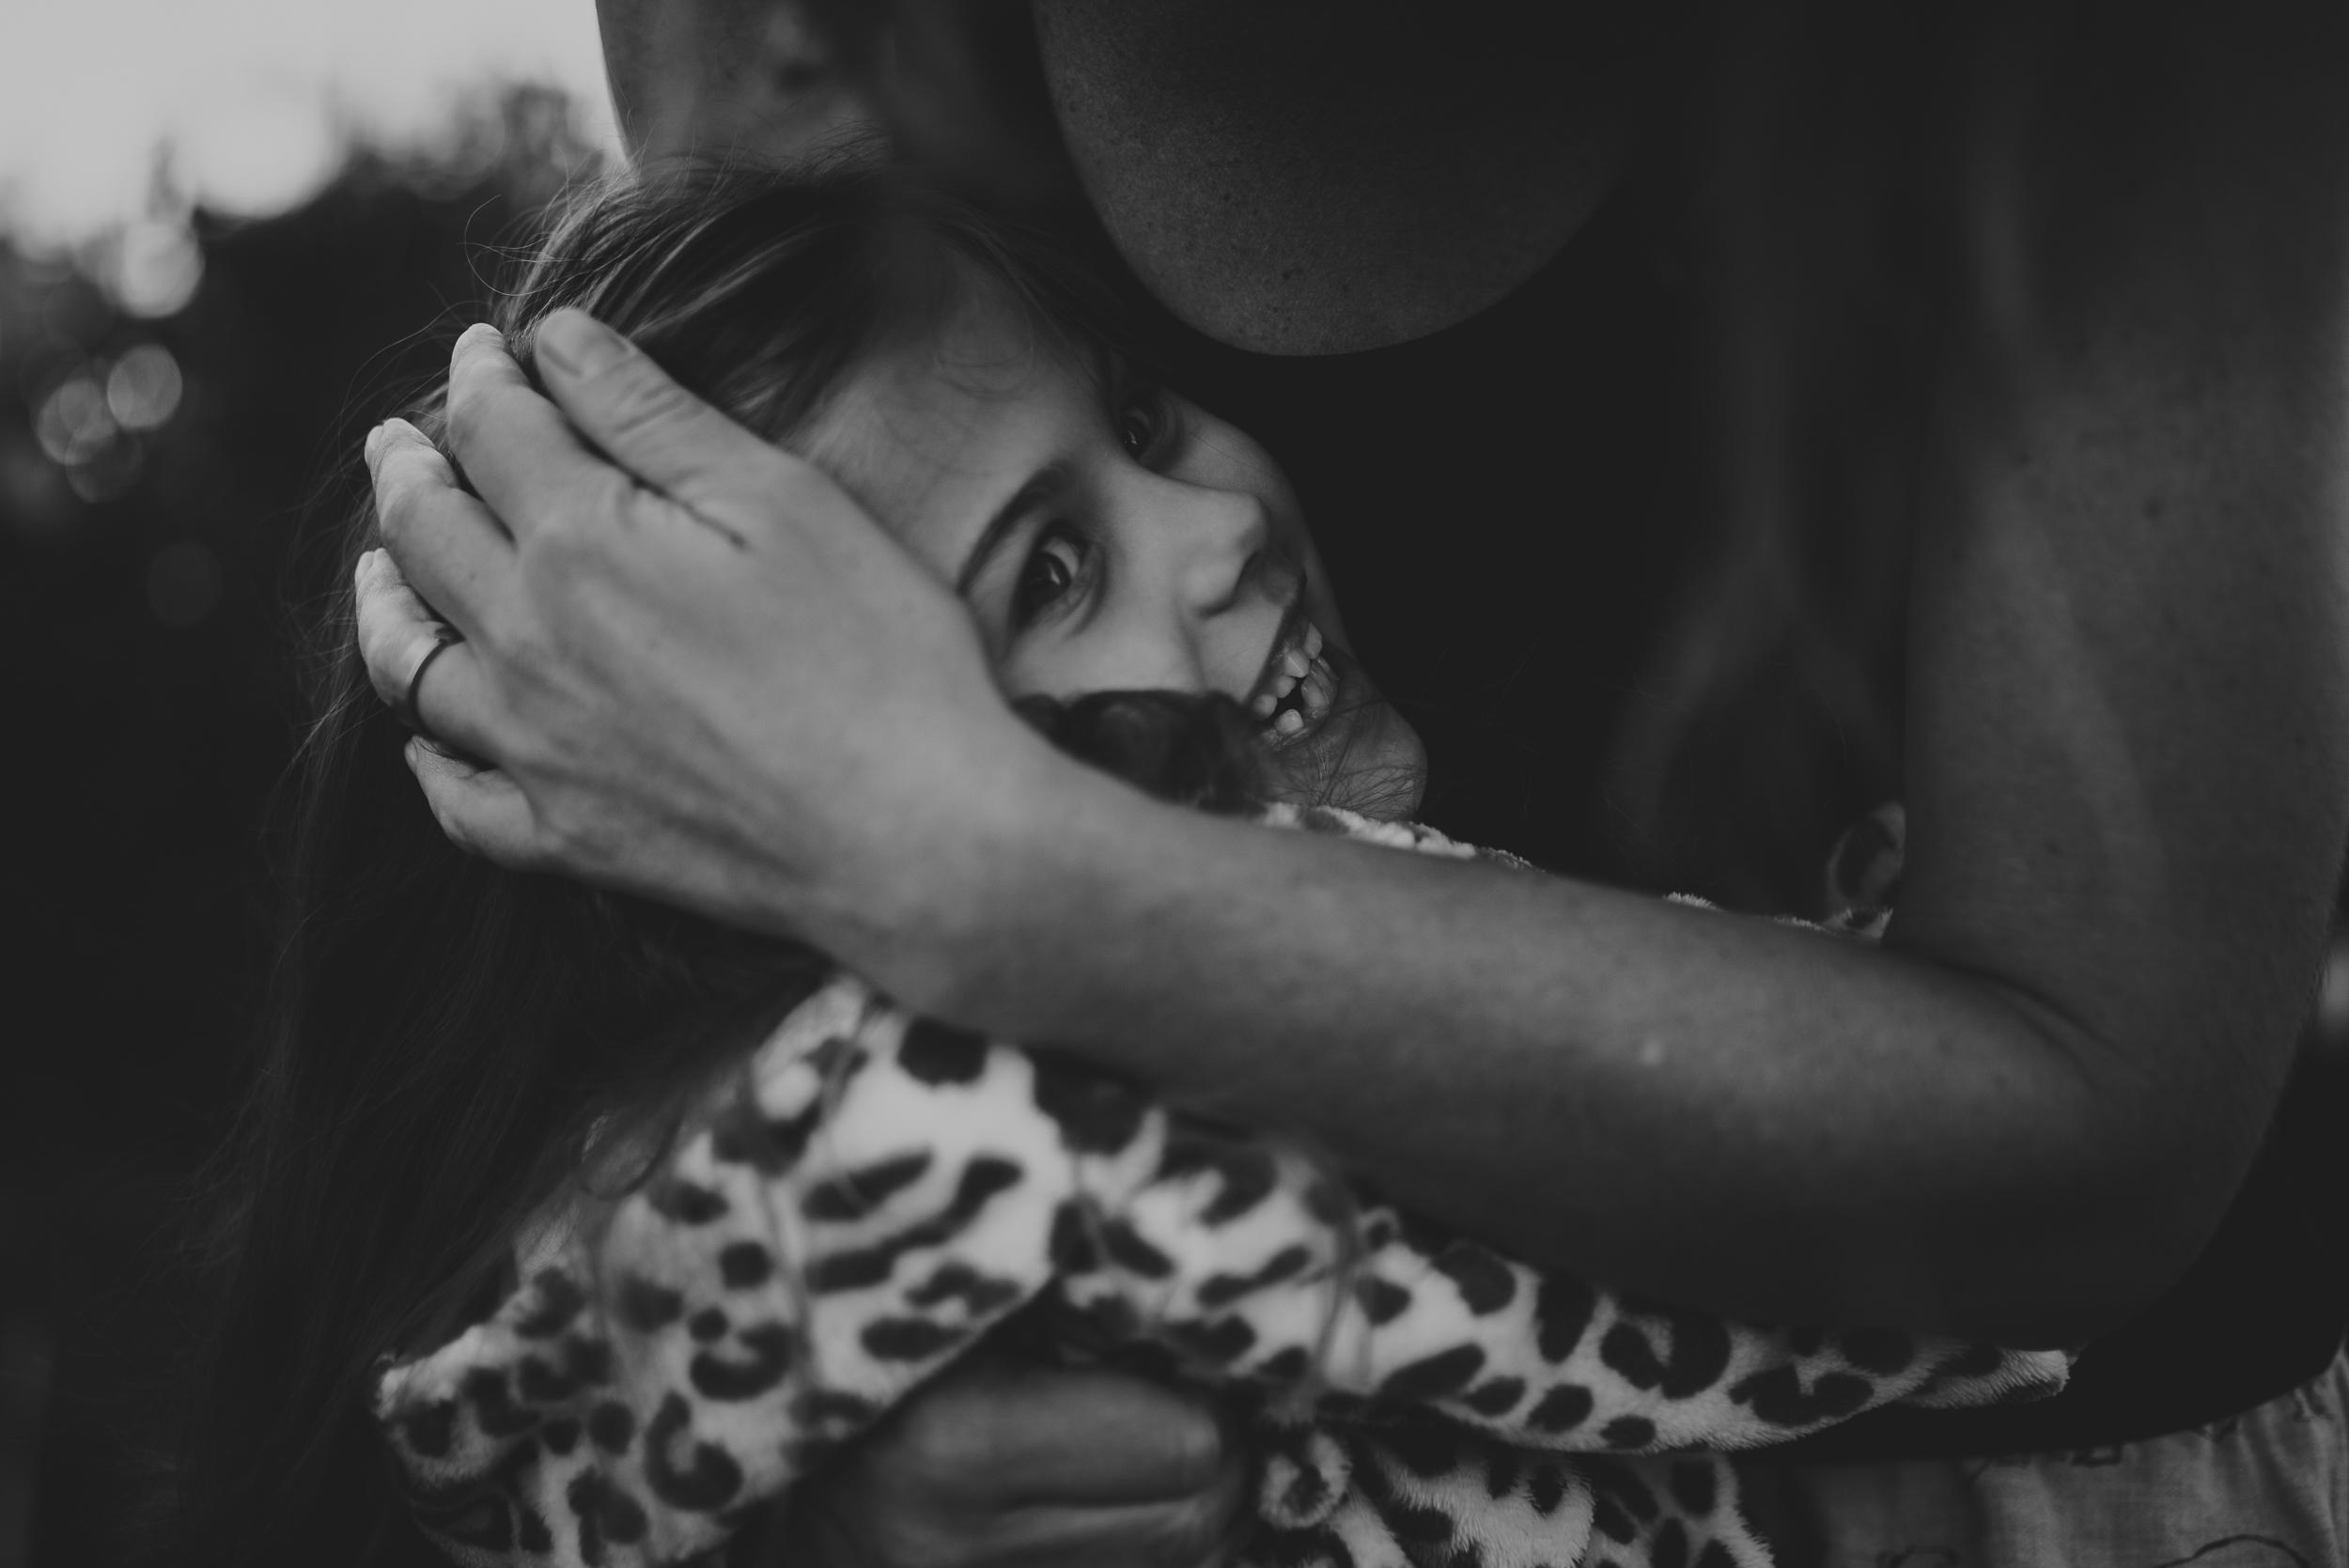 2018-San-Diego-Family-Lifestyle-Newborn-Travel-Vacation-Photographer-Kelsey-Smith-Photography-Coronado-La-Jolla-Encinitas-Solana-Beach-Del-Mar-267.jpg